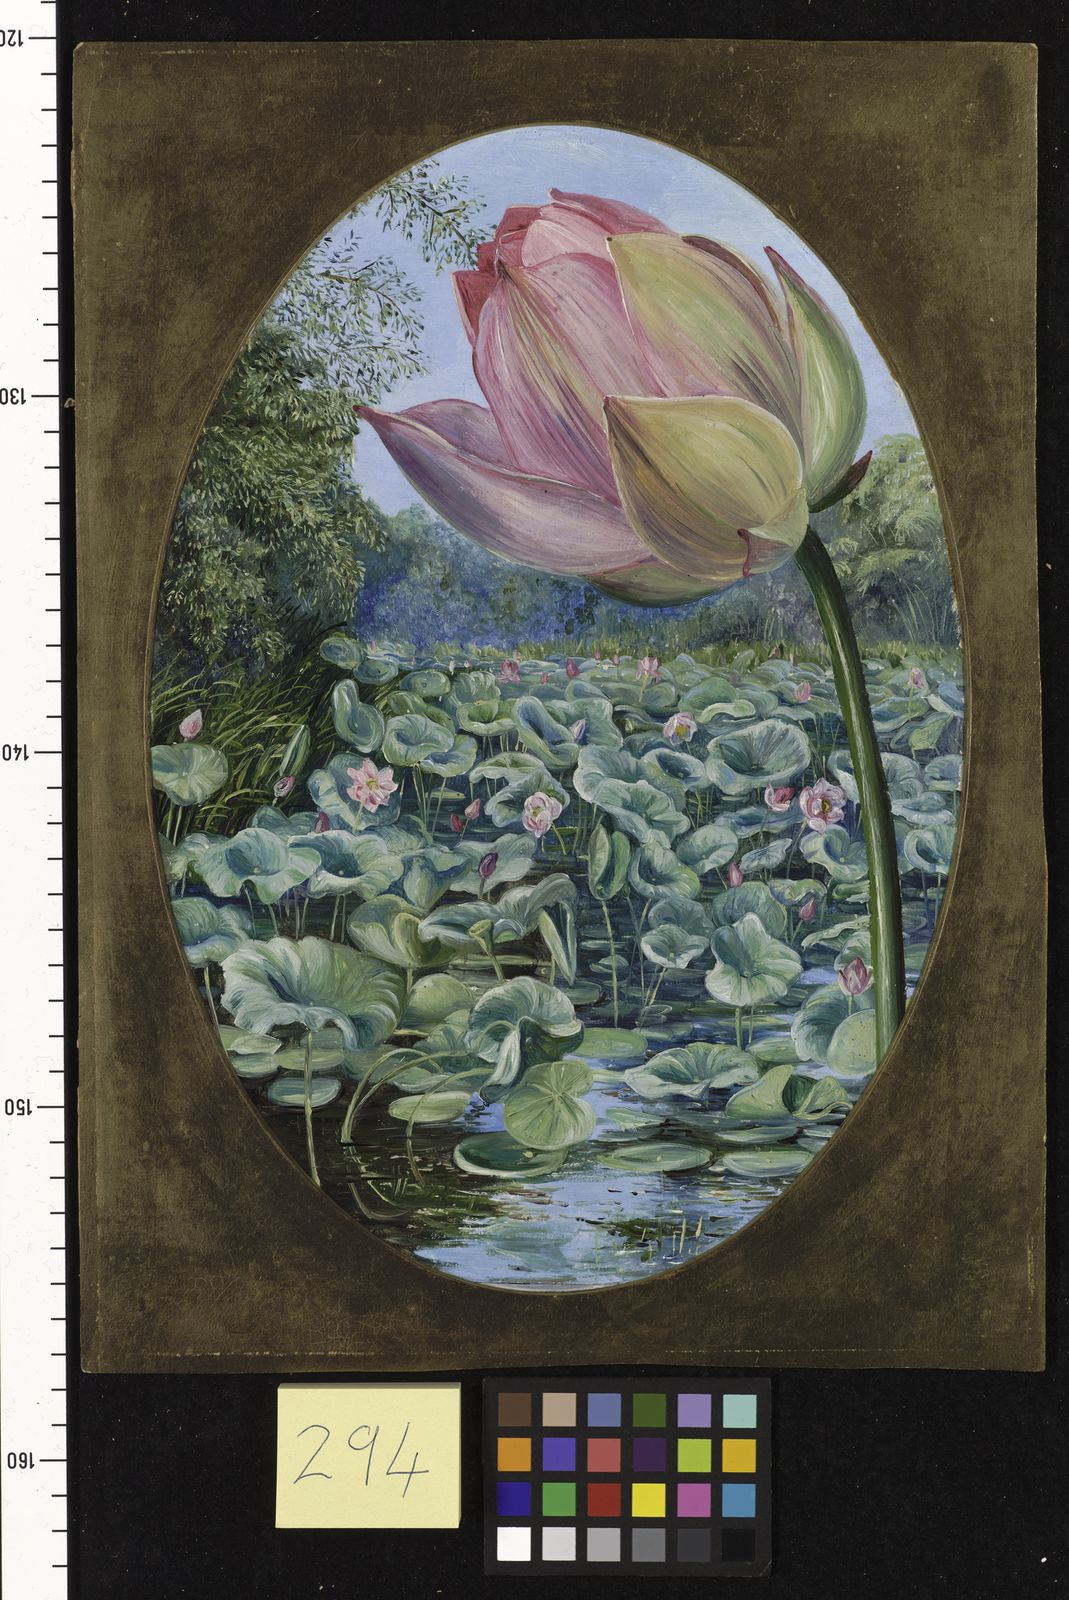 Nelumbo Nucifera Gaertn Plants Of The World Online Kew Science